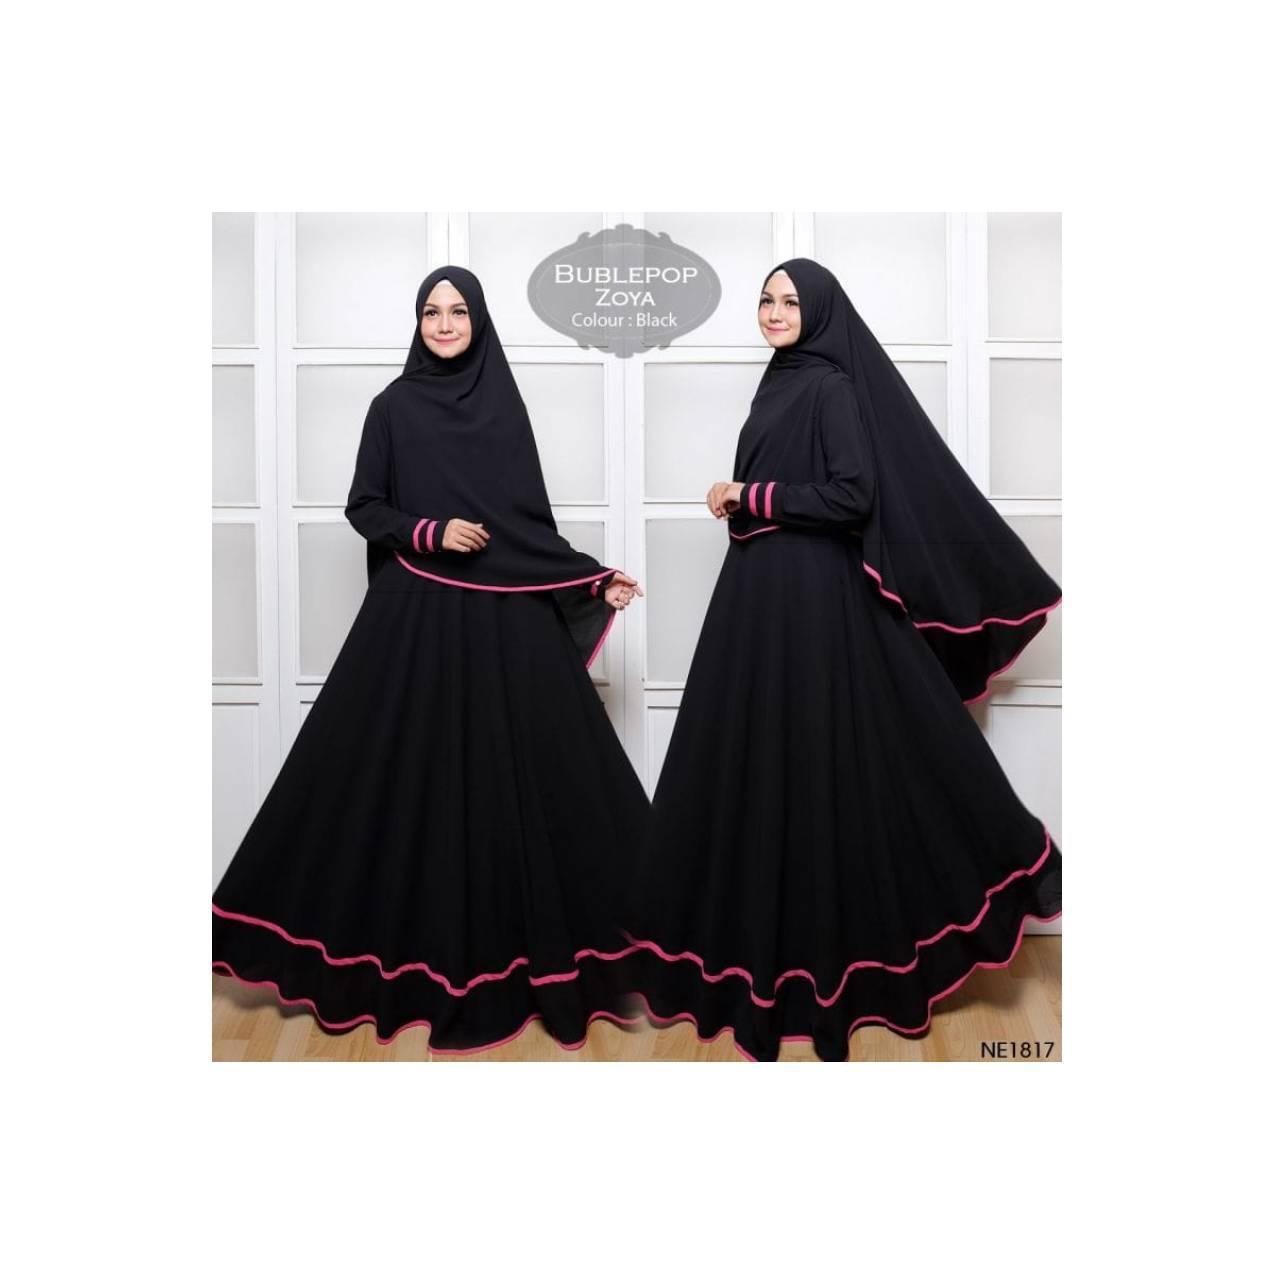 NE1817 | GAMIS BUBLE ZOYA SYARI - DRESS PESTA MUSLIMAH ELEGAN ORIGINAL